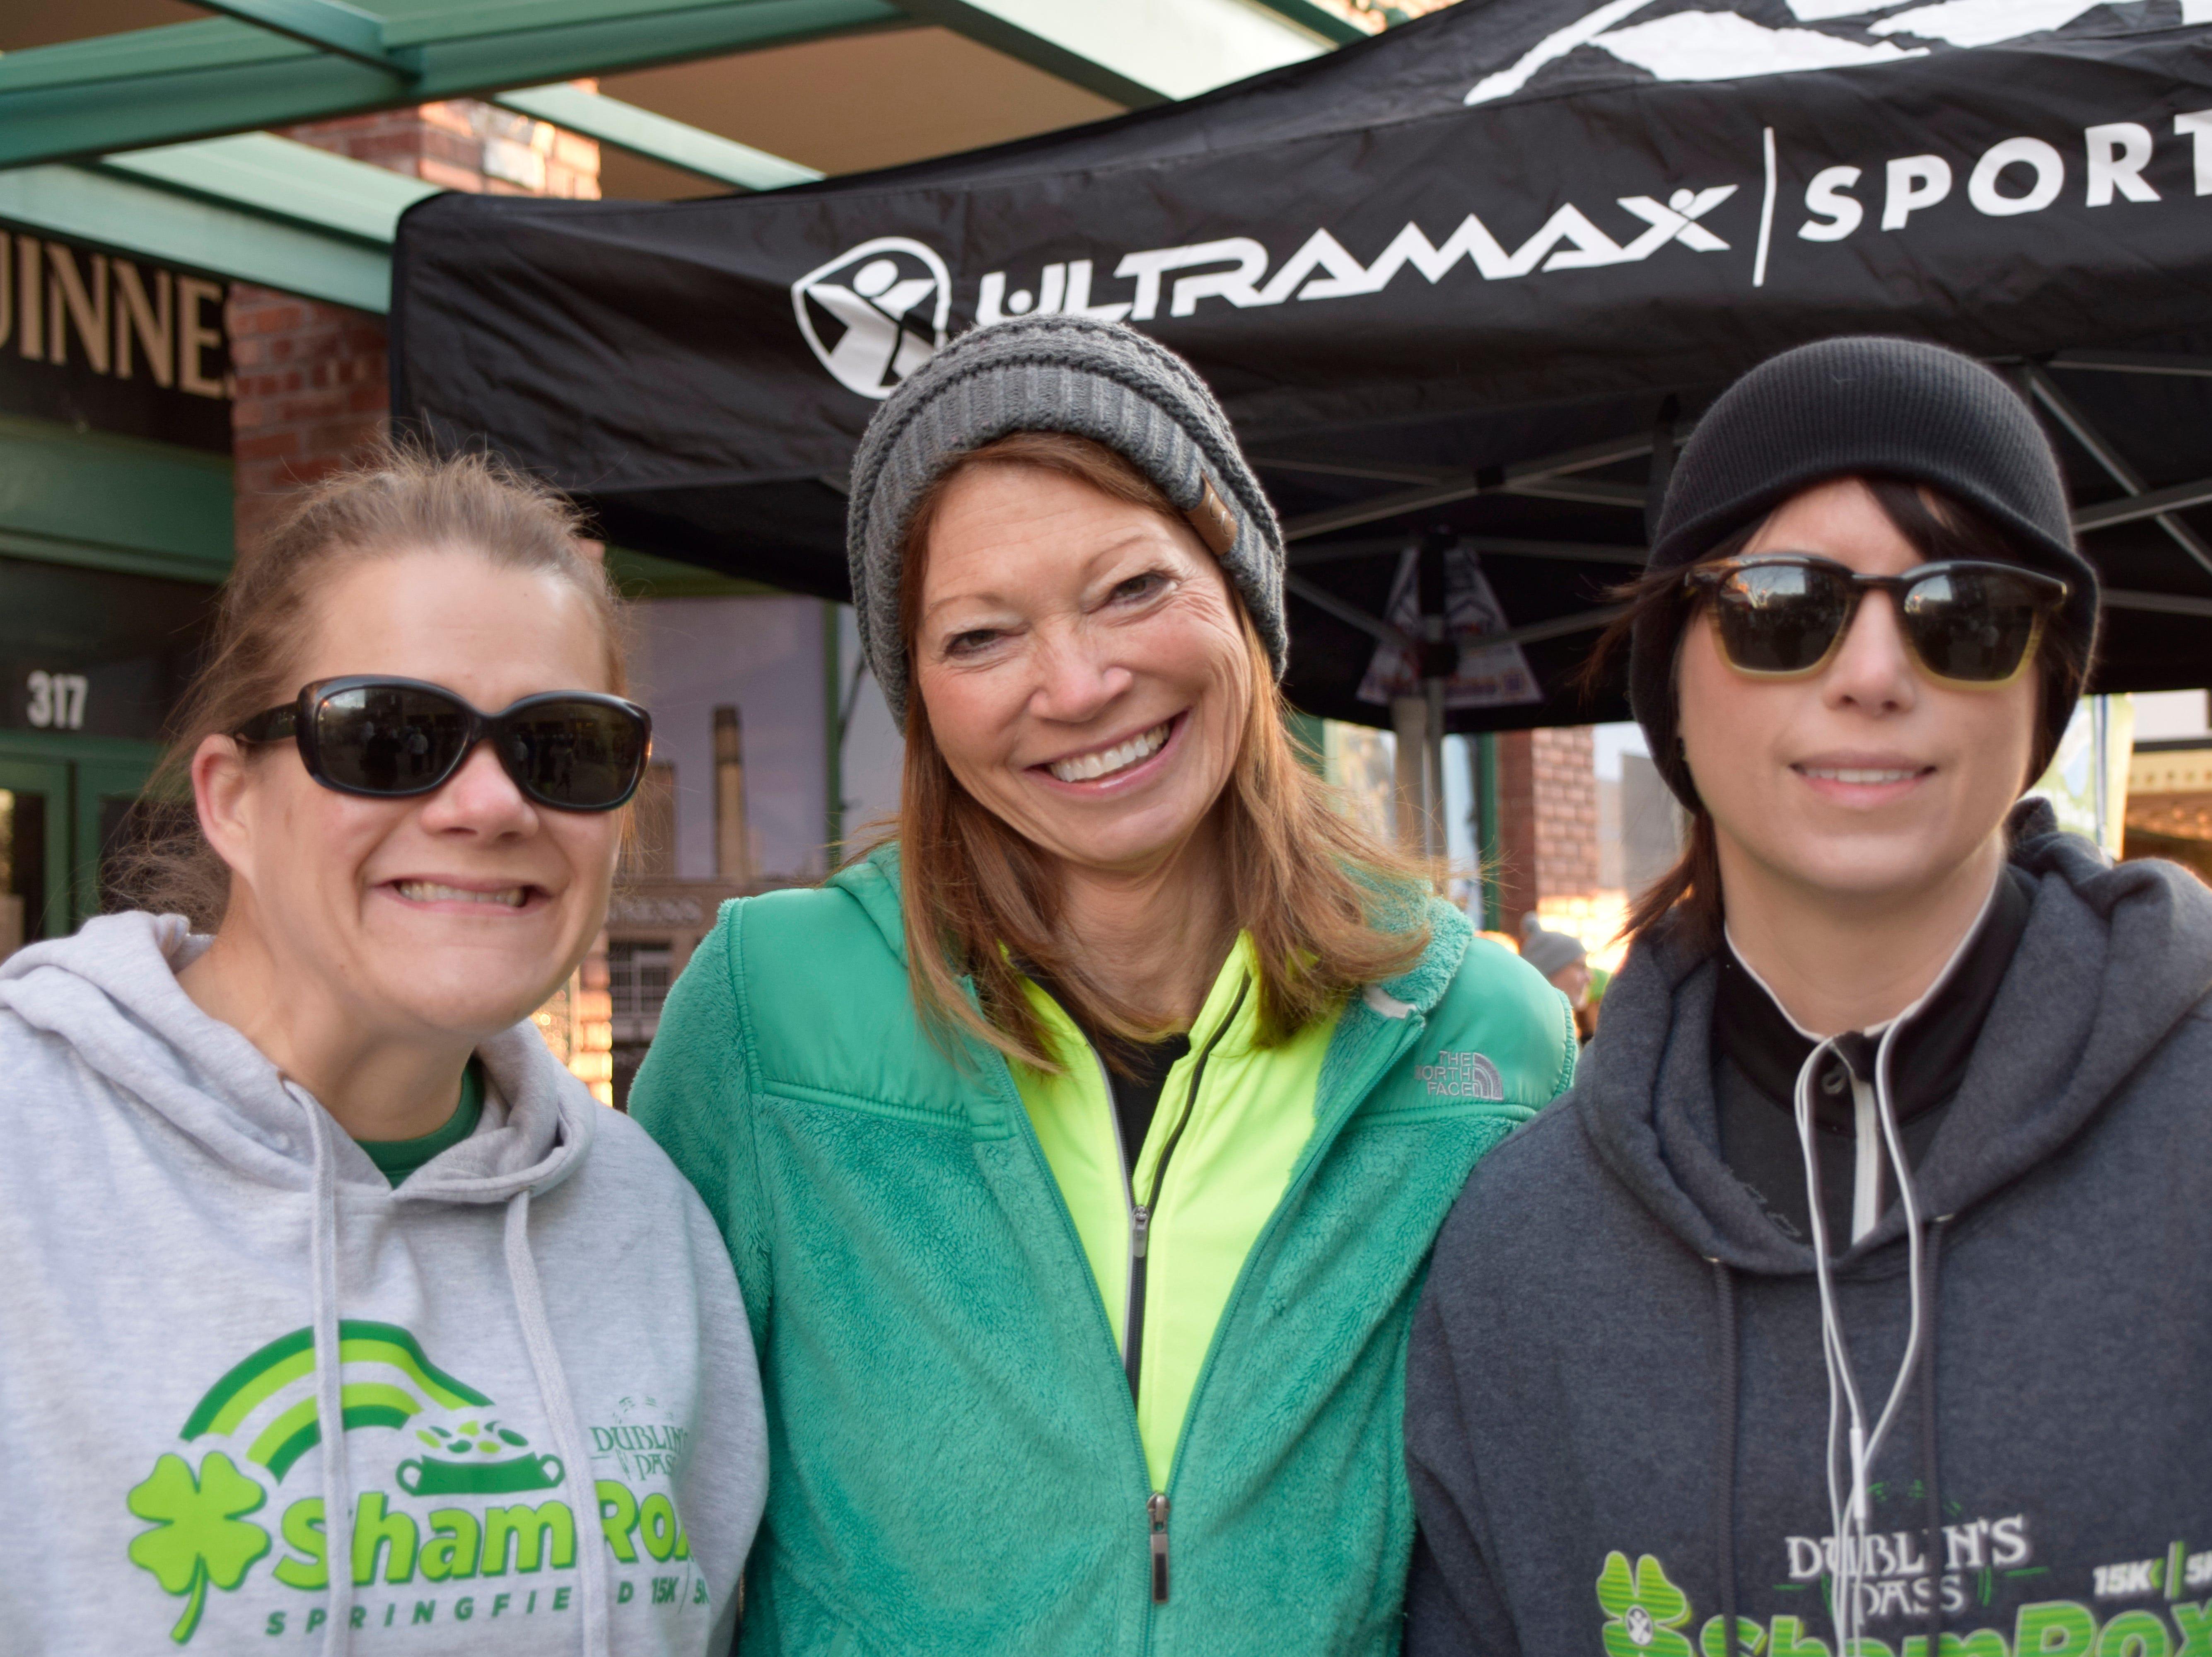 Sarah Limb, Laura Evans and Jodi Sherrell